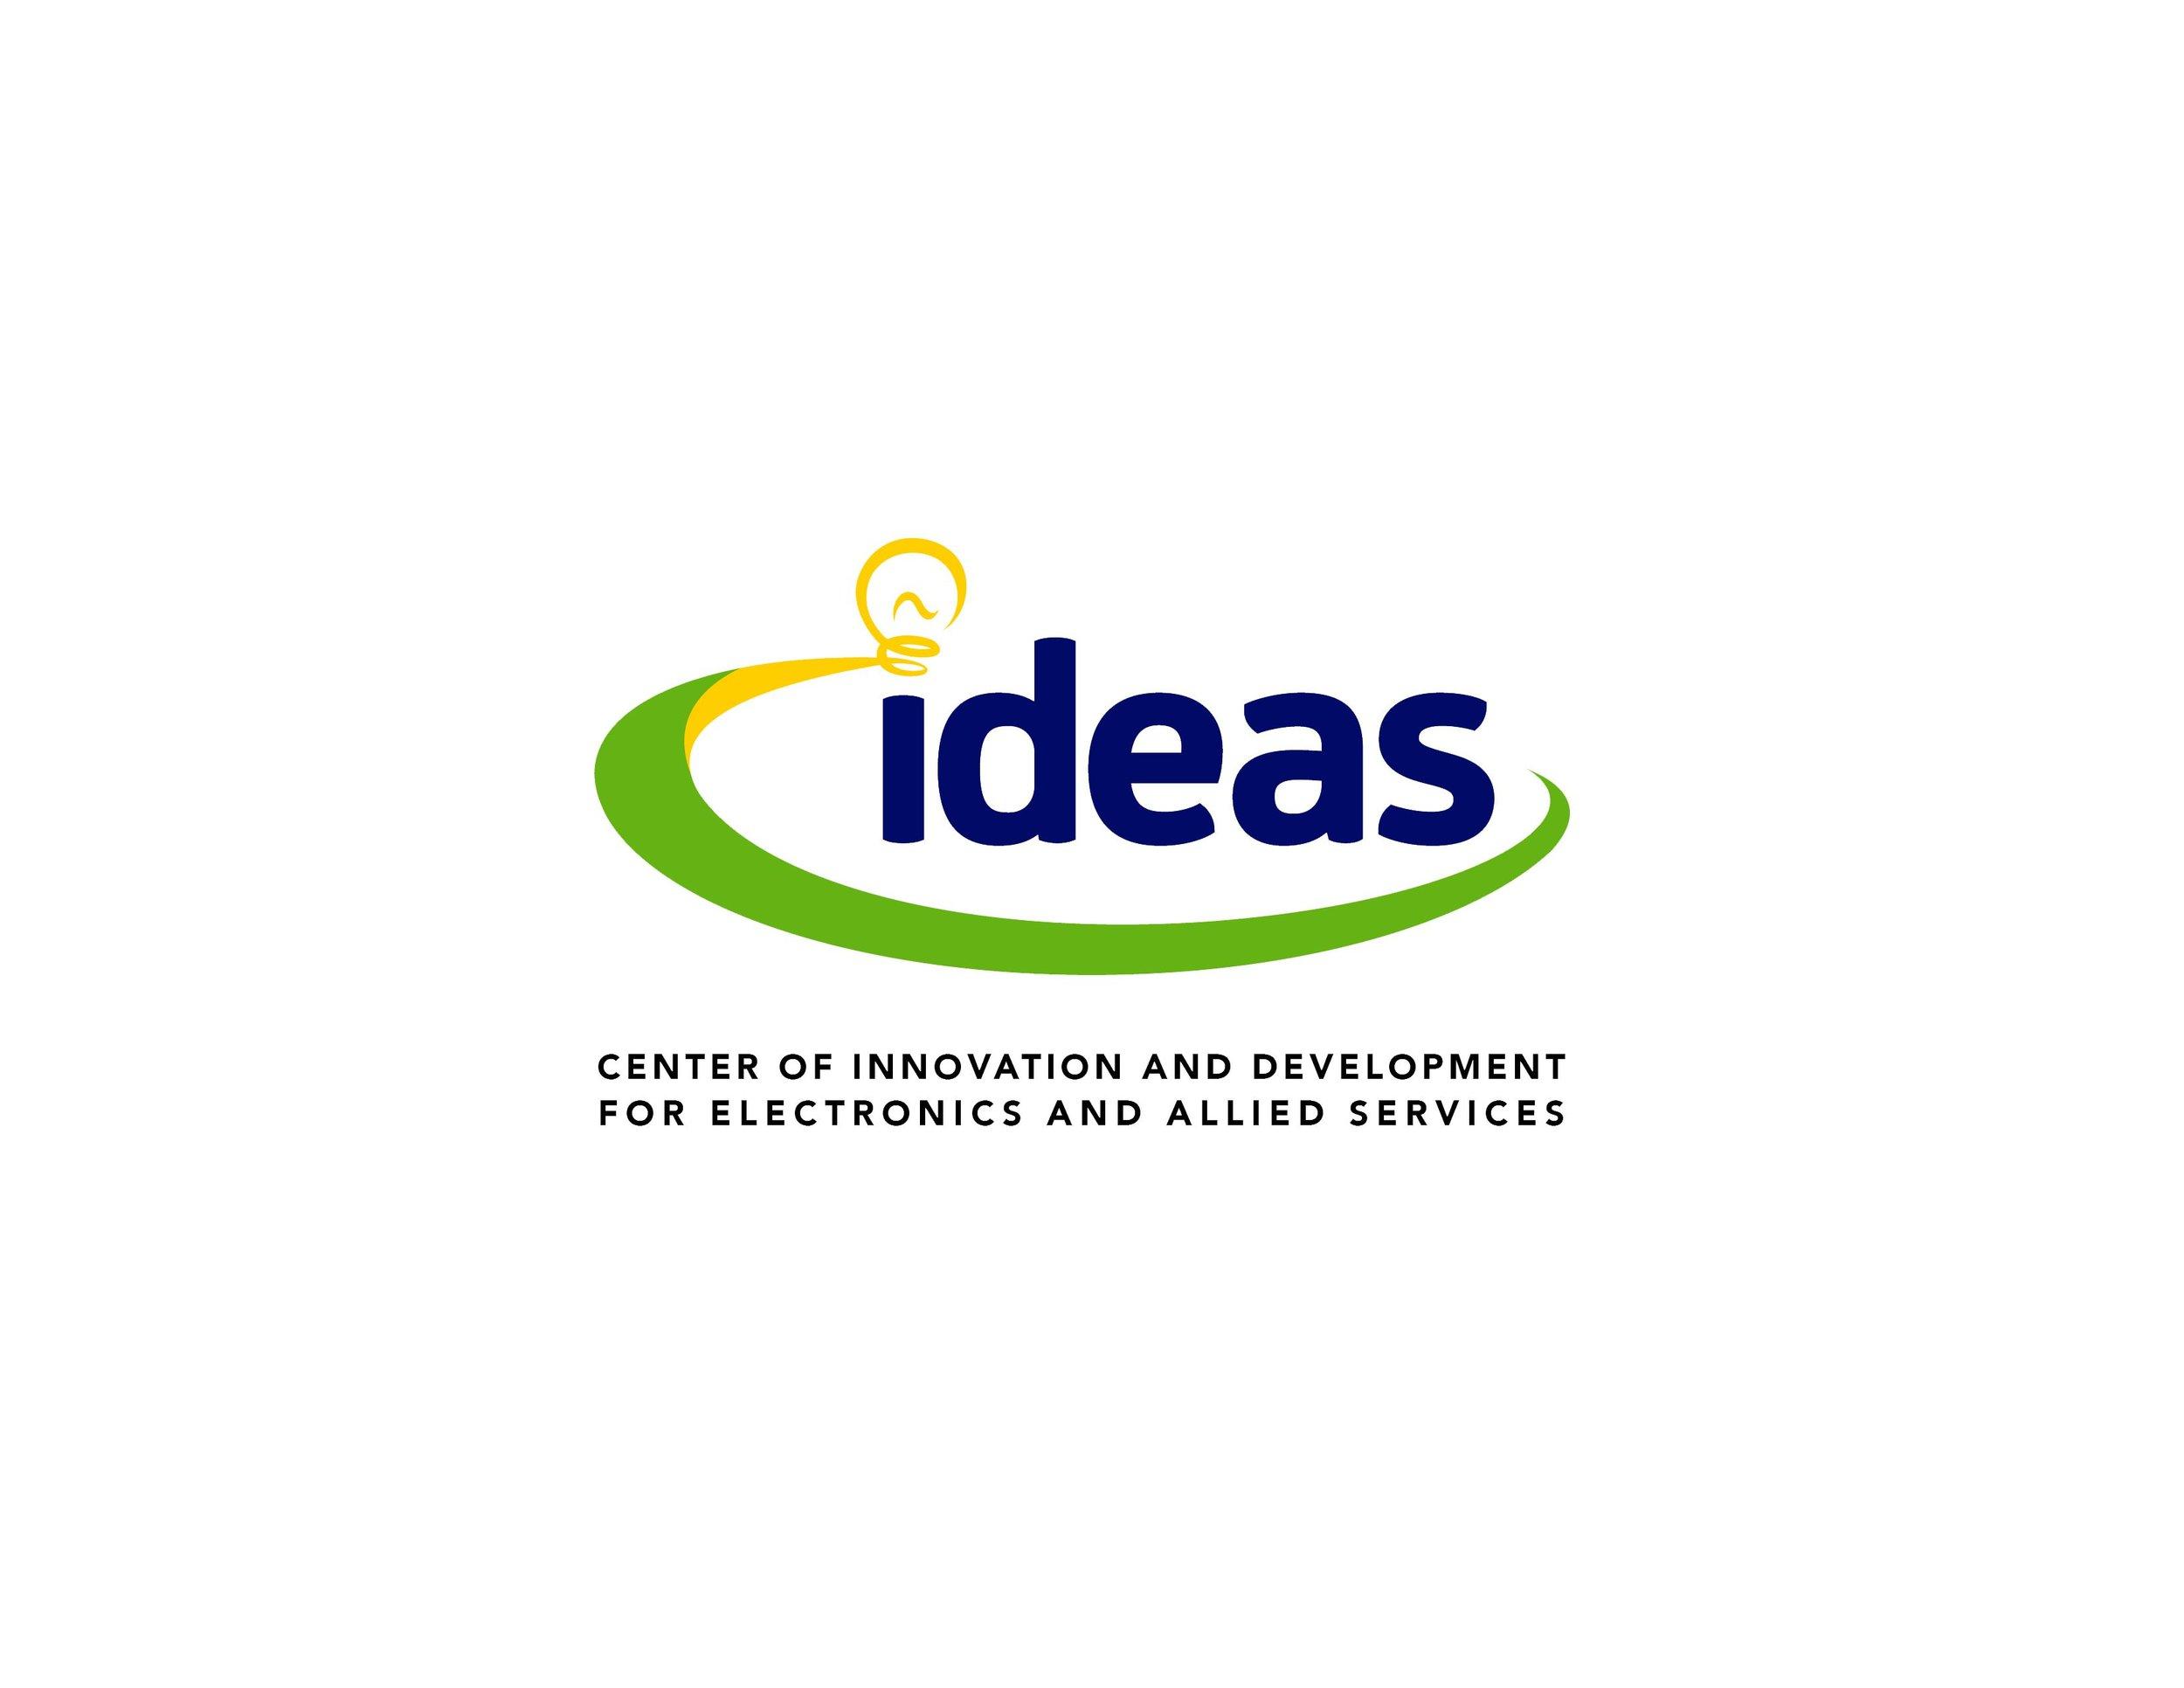 C-IDEAS-logo-Nov2016-JPEG.jpg